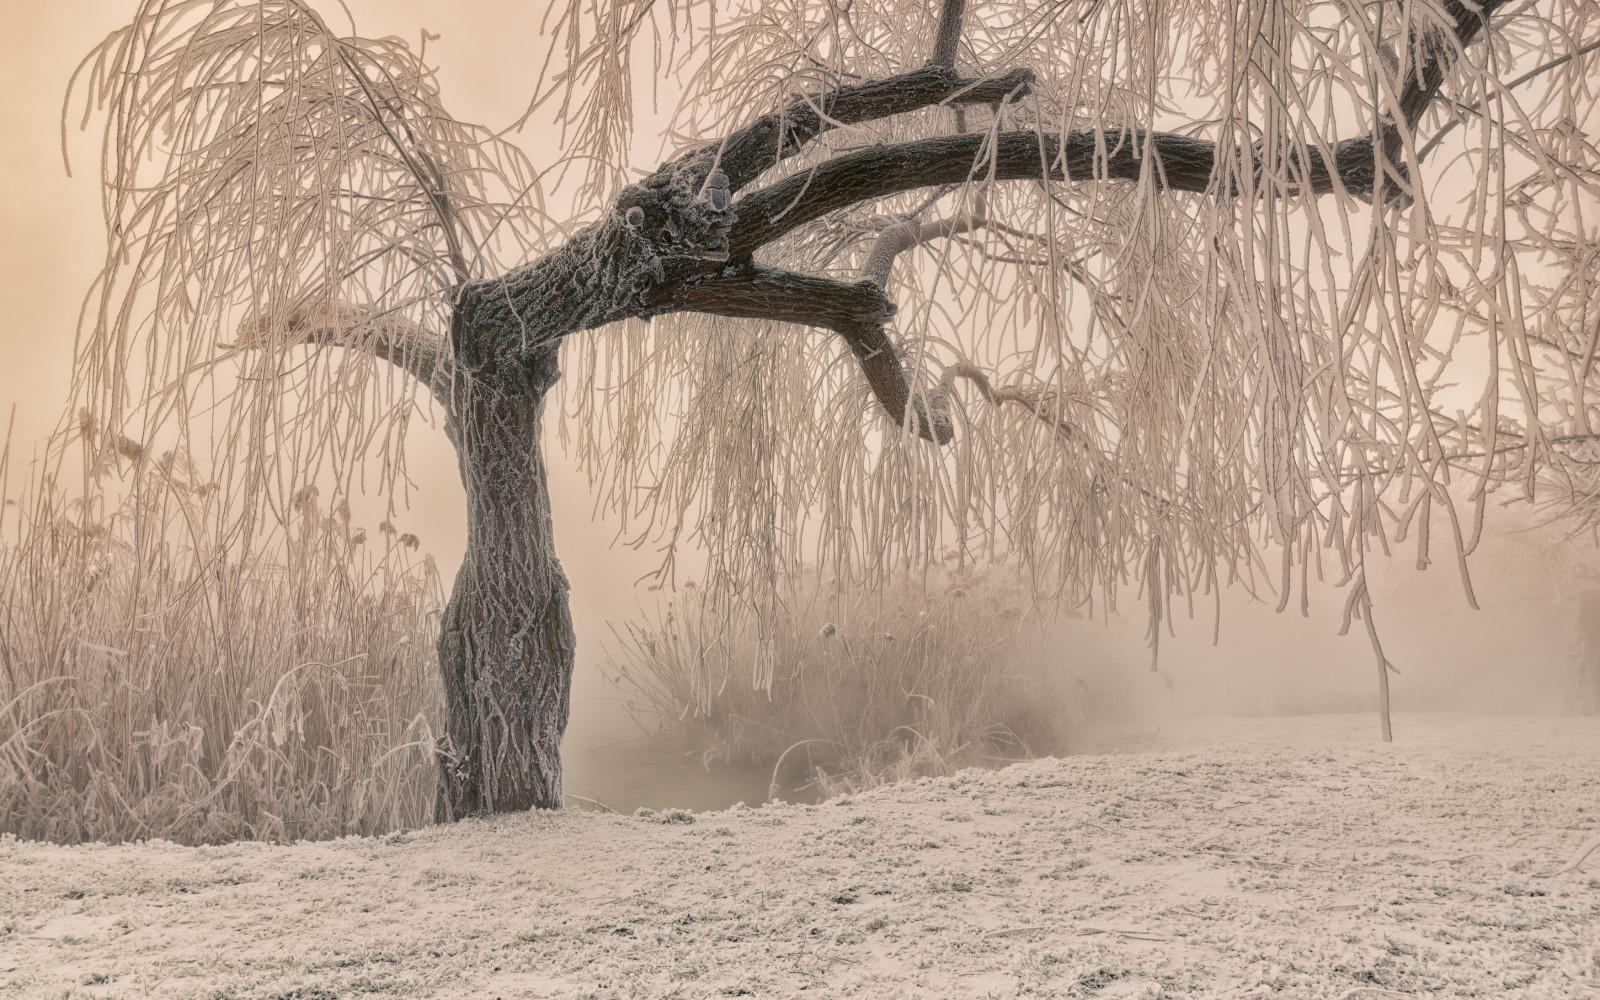 Zima.-Rossiya.-Zimnee-utro-v-Krasnodare.-avtor-foto-Aleksandr-Plehanov